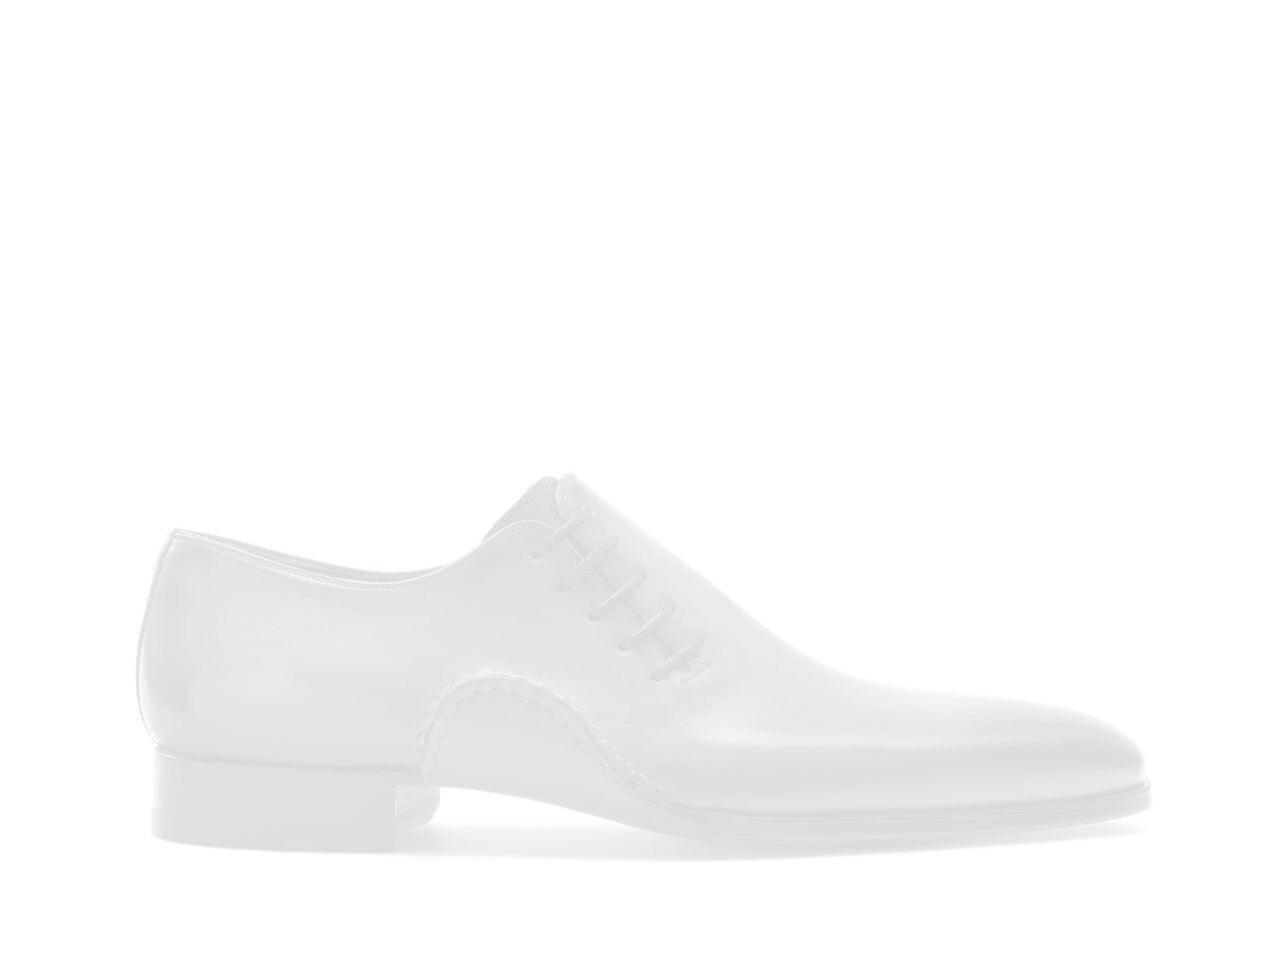 Sole of the Magnanni Magnanni X Pelotonia Women's Sneakers